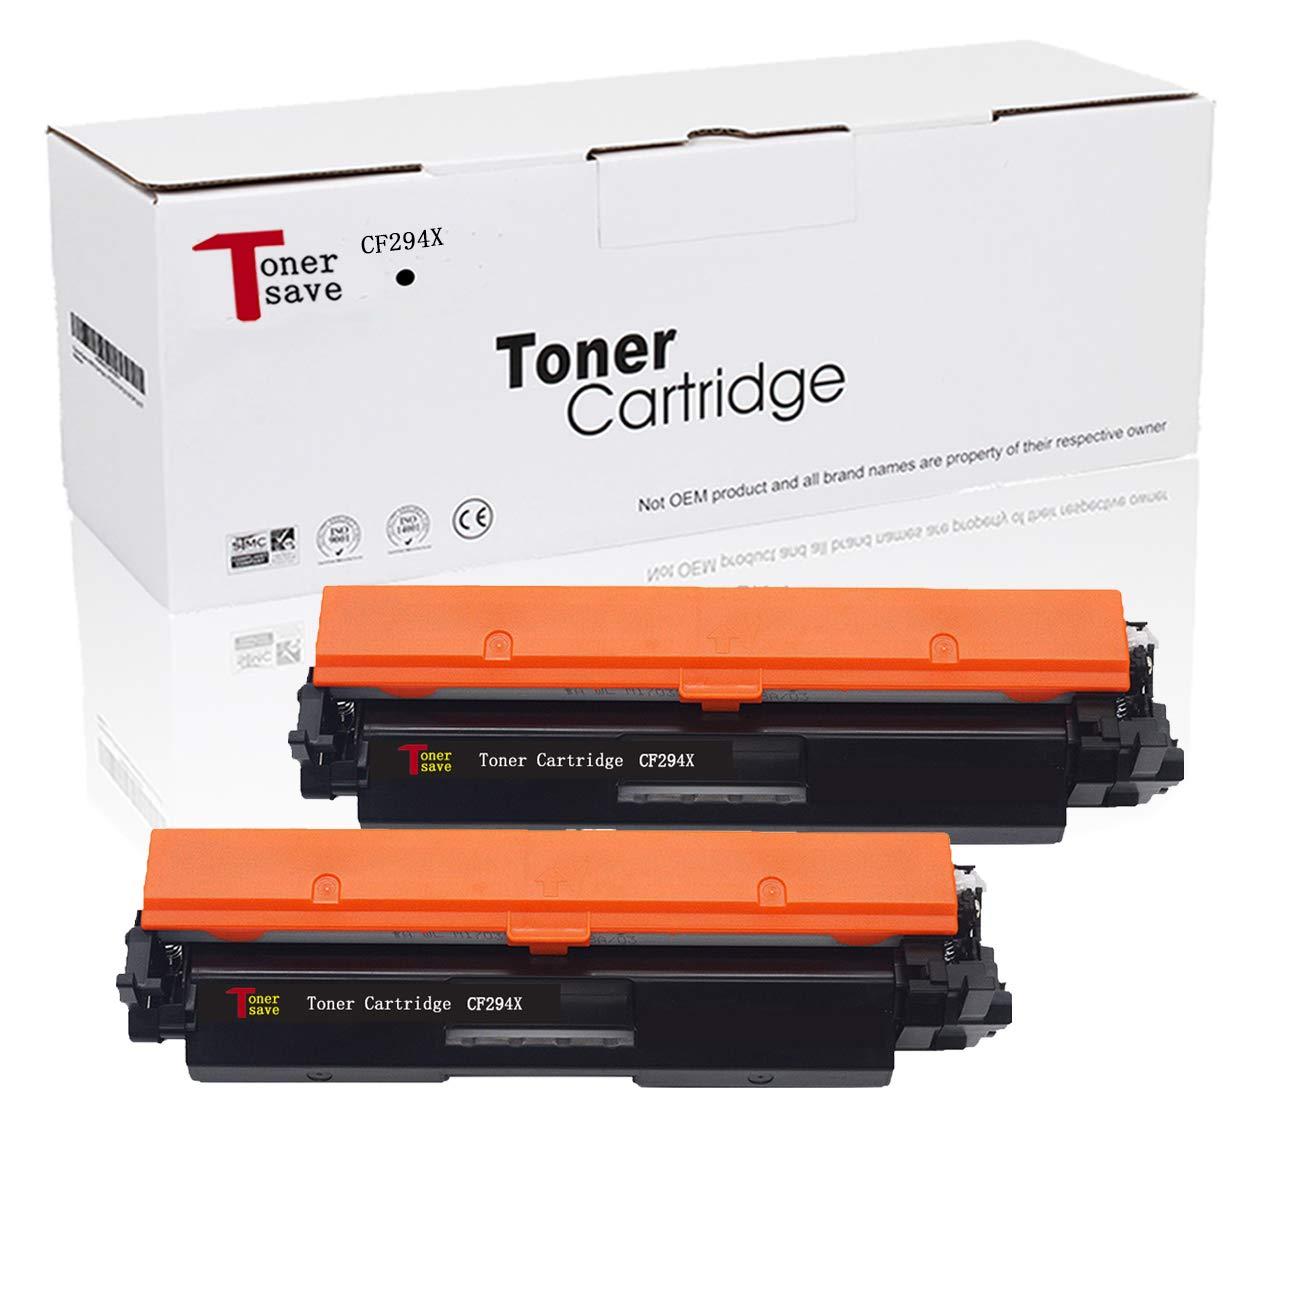 Tonersave 2PK CF294X CF294A Toner HP 94X 94A Cartridge for HP Laser Jet Pro M118dw MFP M148fdw MFP M148sw MFP M149fdw Printer